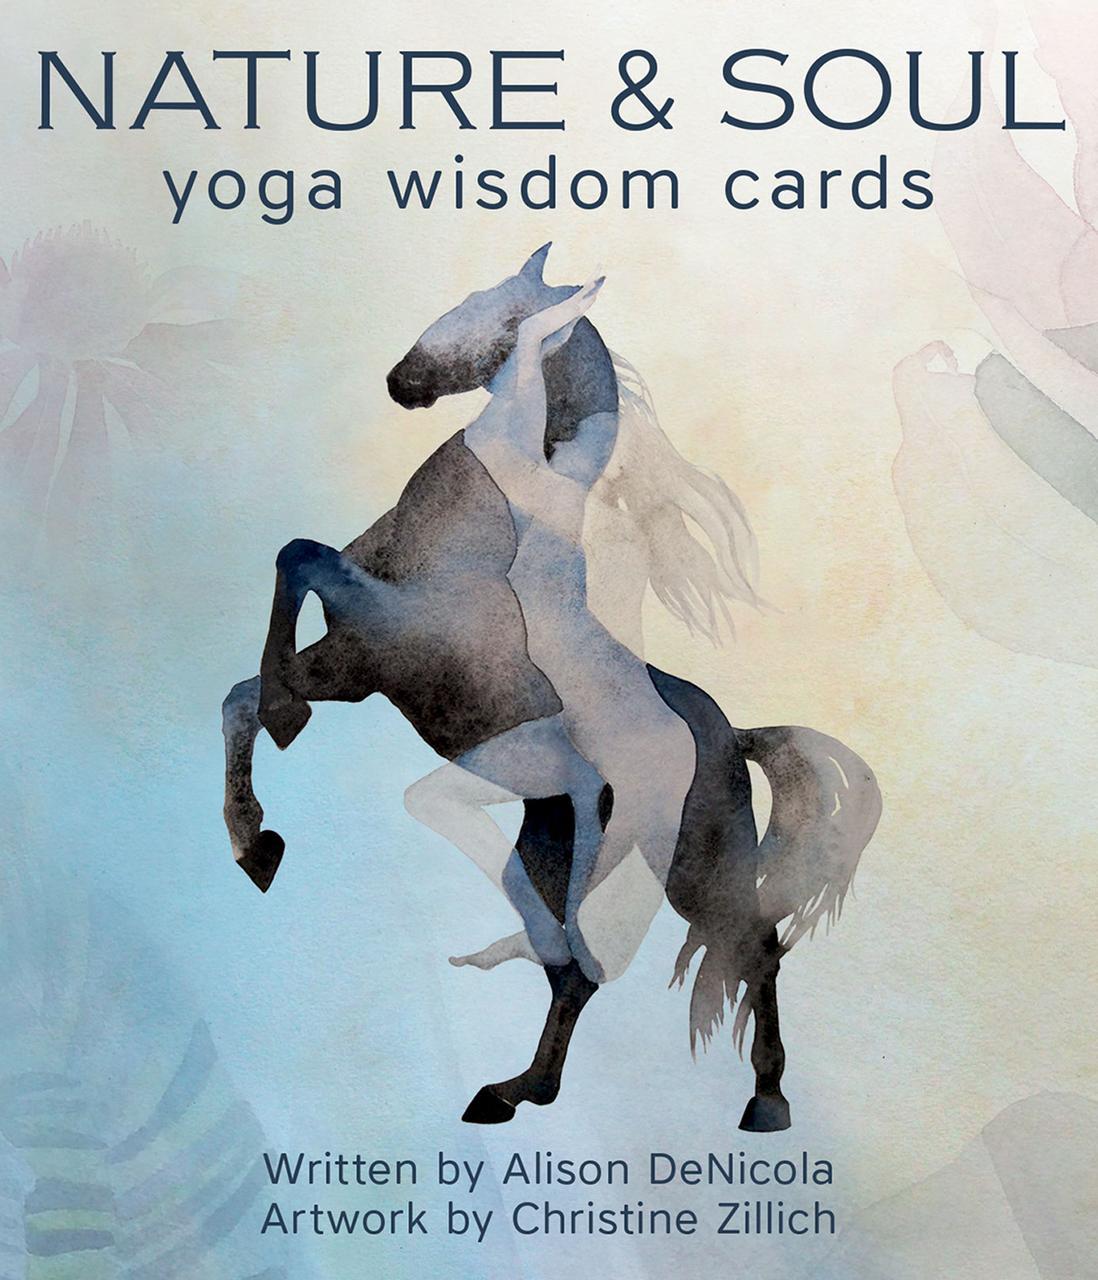 Nature & Soul Yoga Wisdom Cards/ Природа і Душа. Йога Мудрість